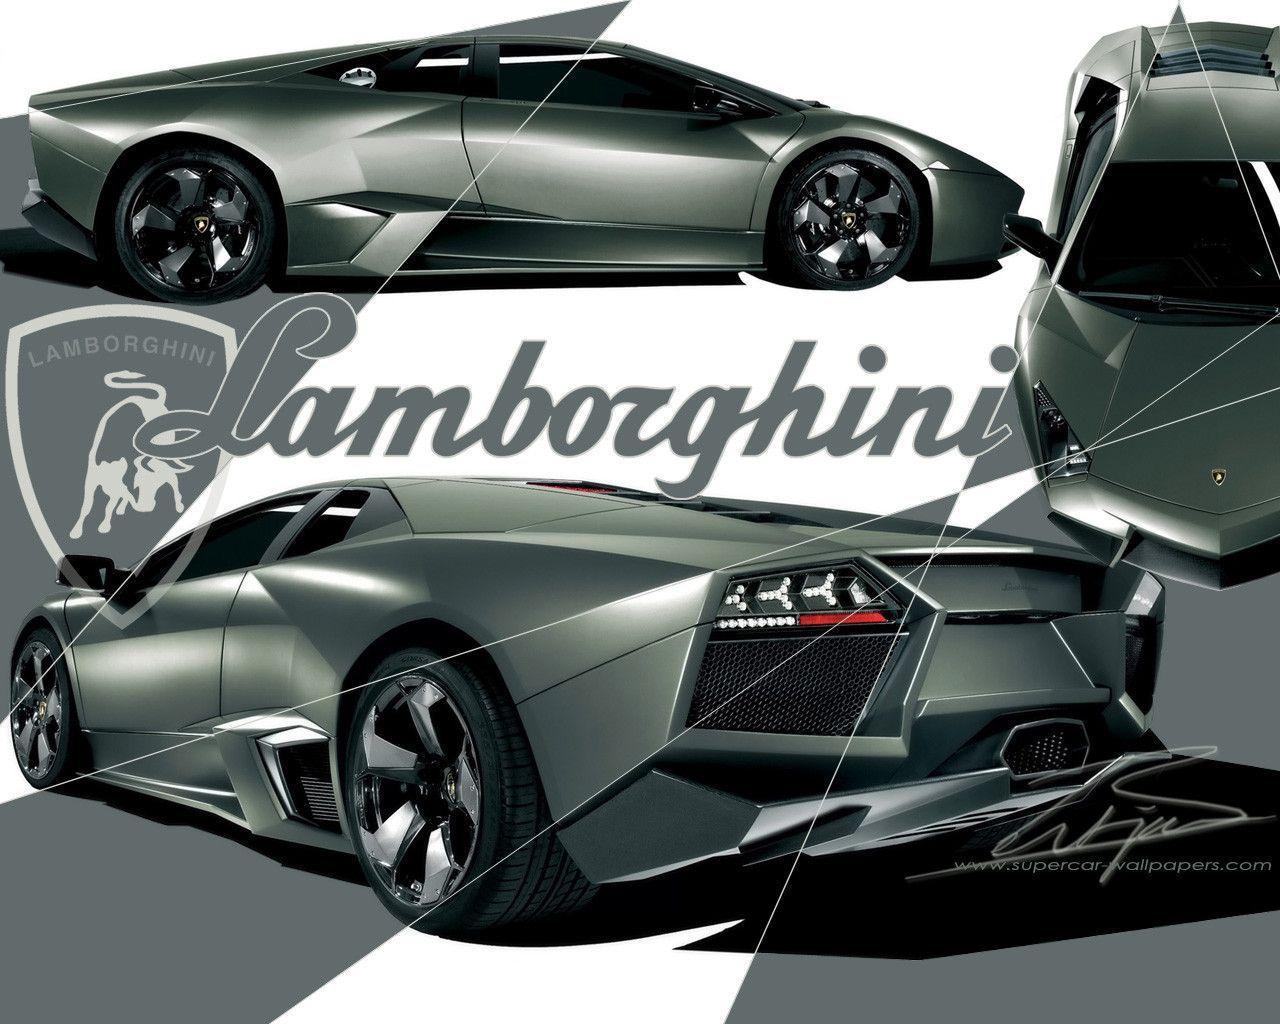 Lamborghini Reventon Roadster Wallpaper Hd